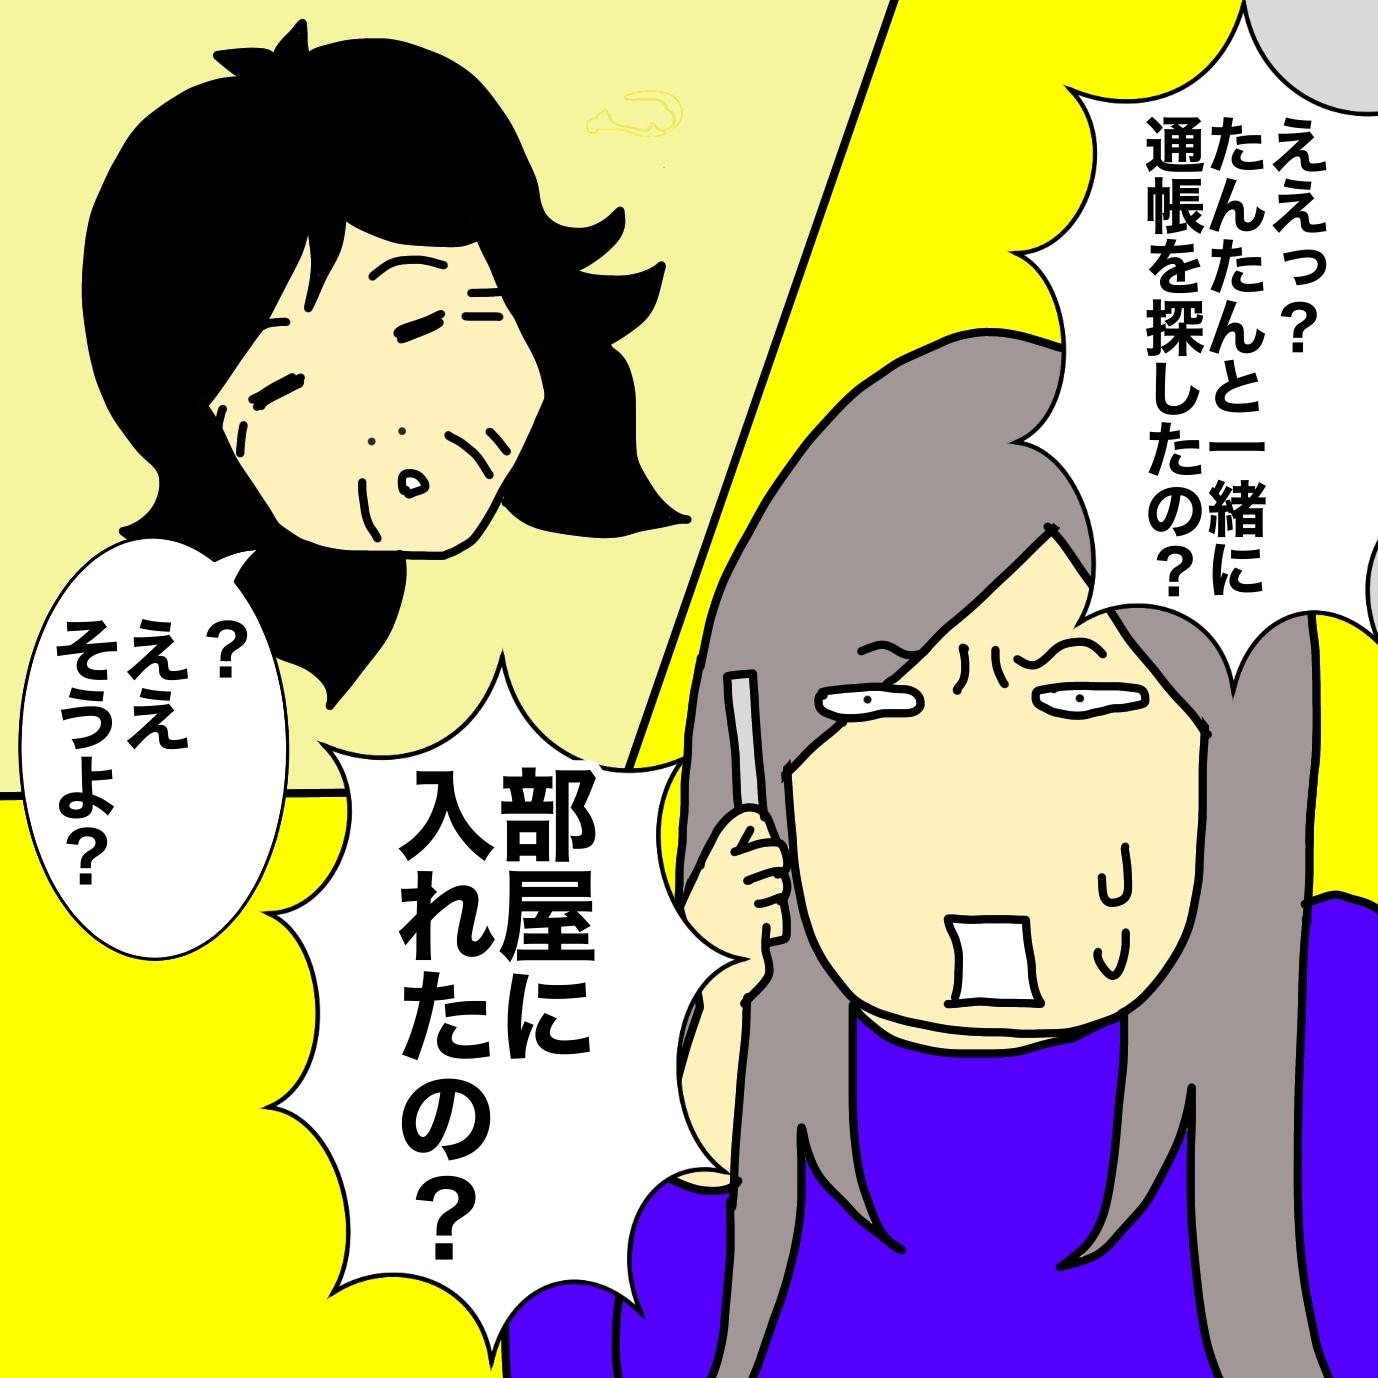 Image (3).jpeg